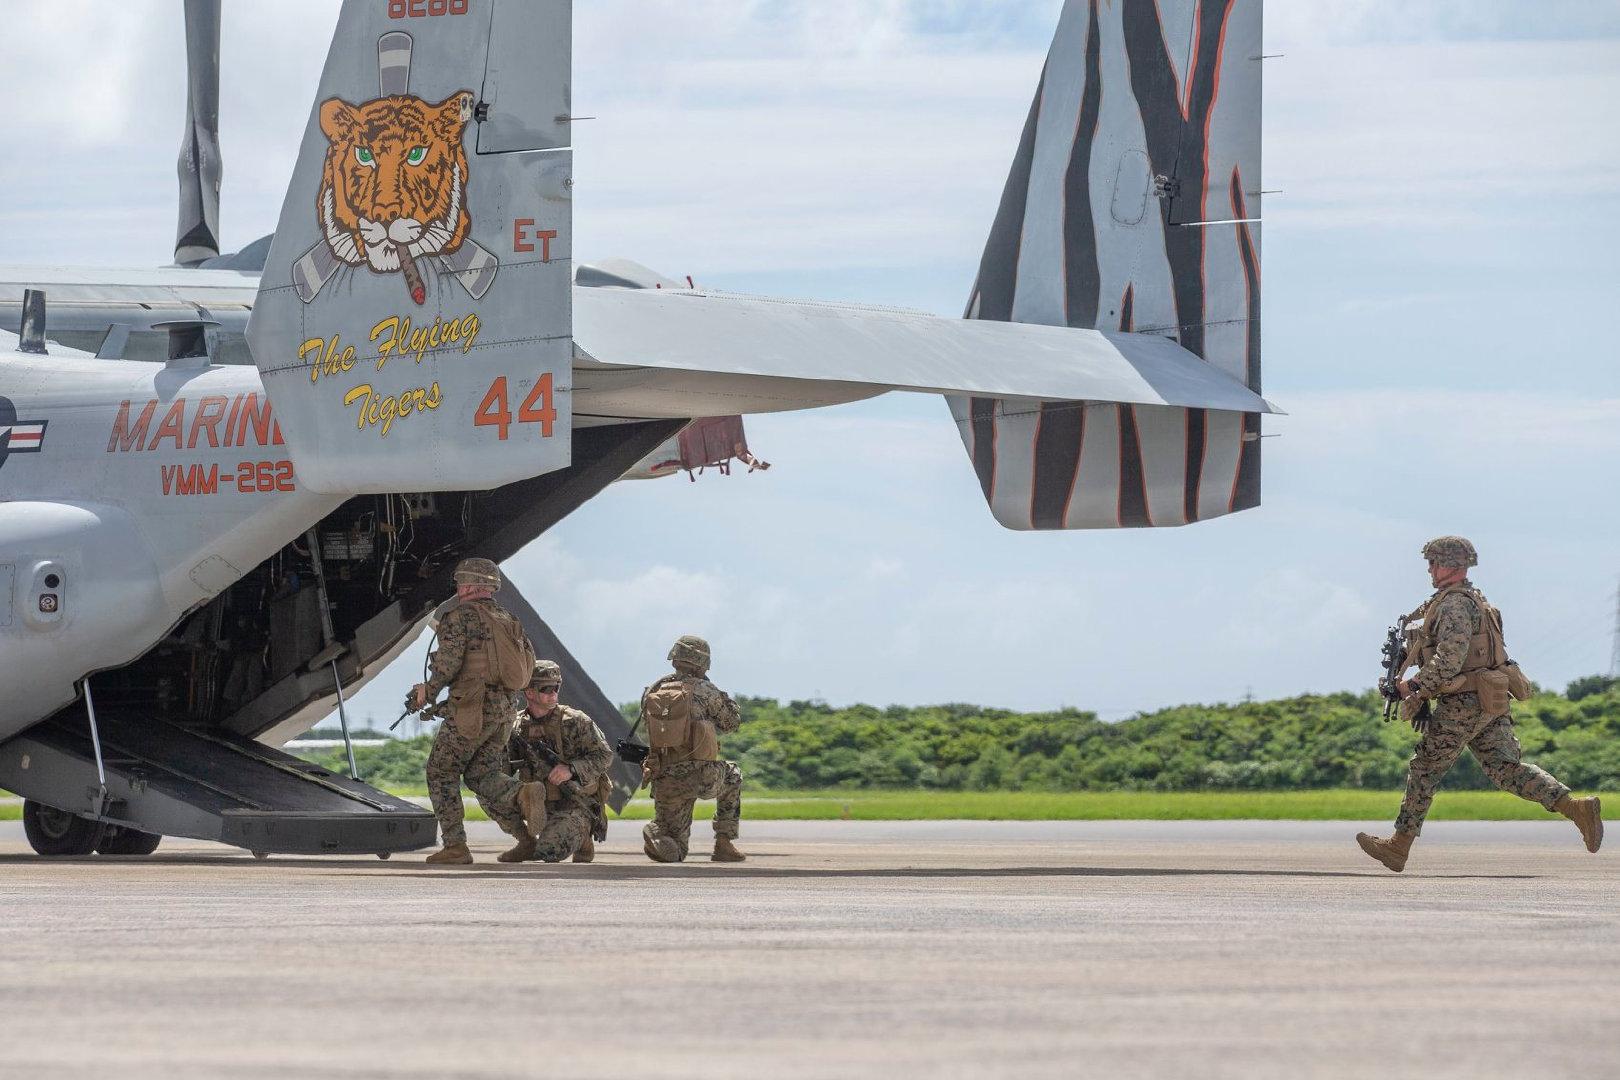 31st MEU的陆战队员和陆战队VMM-262中队的虎头鱼鹰联动训练